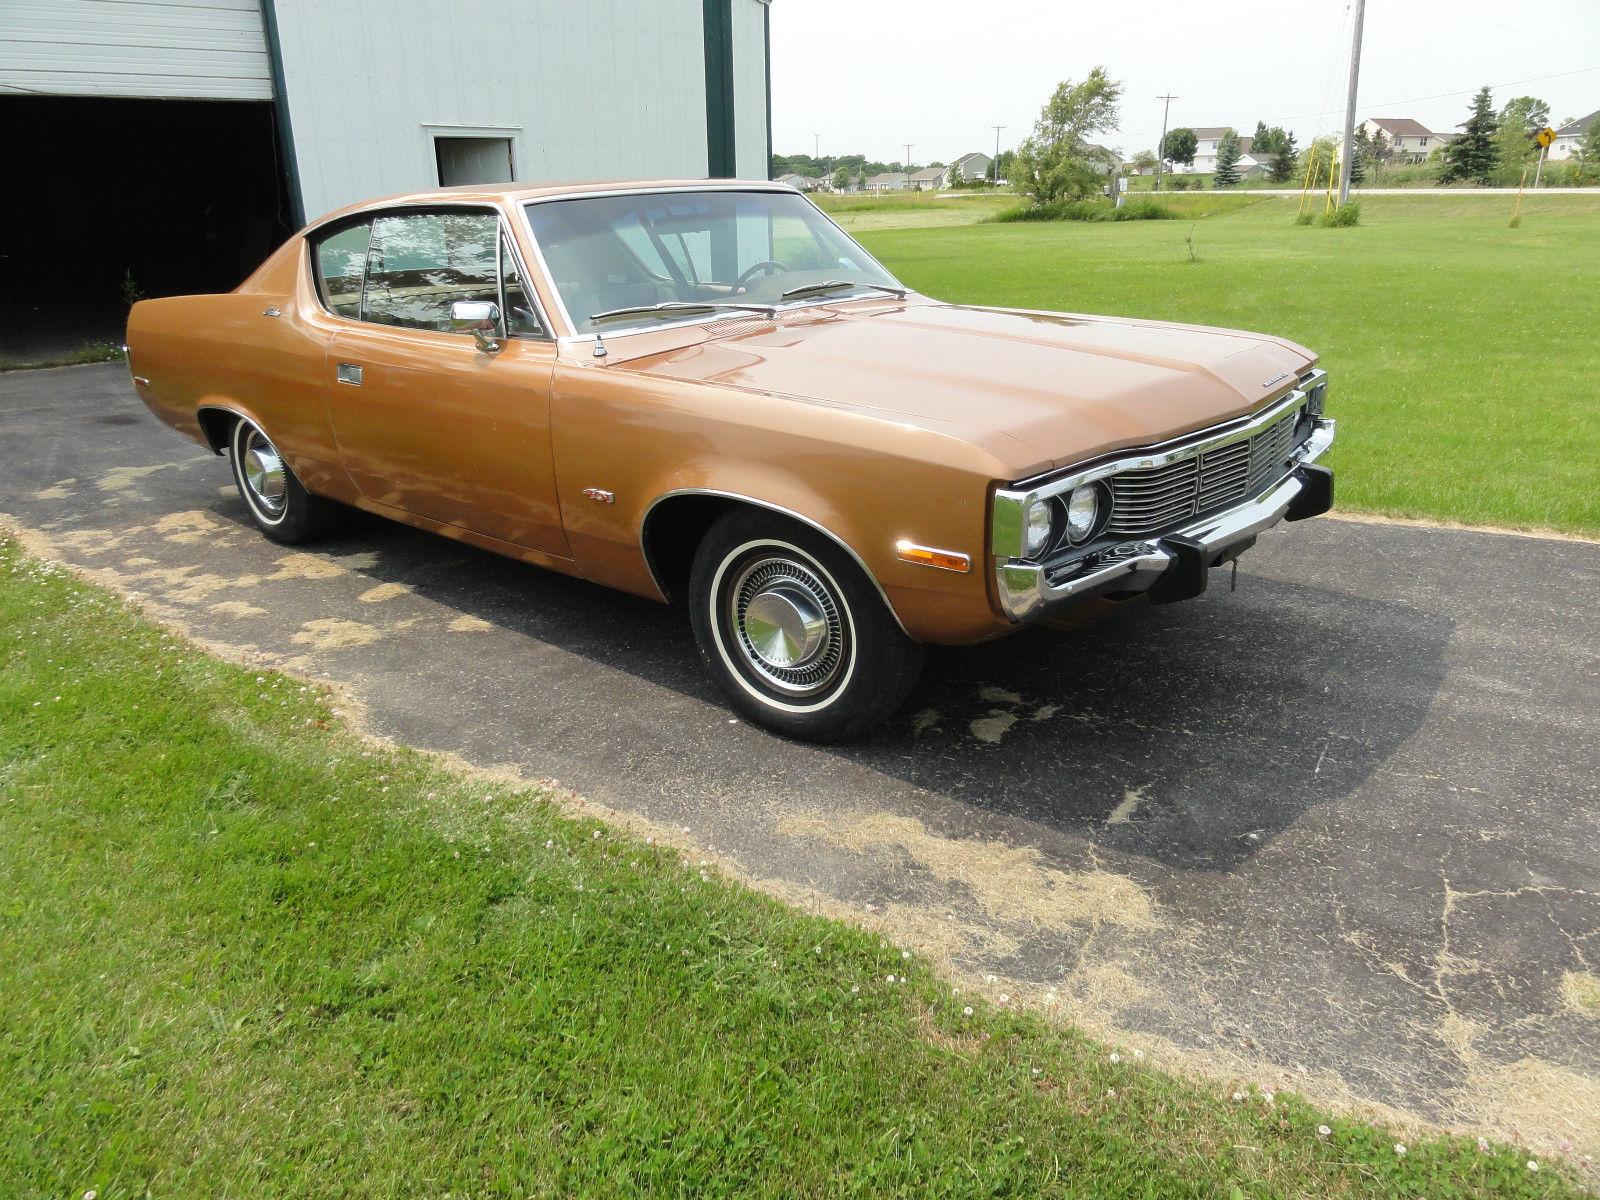 Ebay Find This 1973 Amc Matador Is The Perfect Big Toyota Land Cruiser Blocked Plain Brown Box